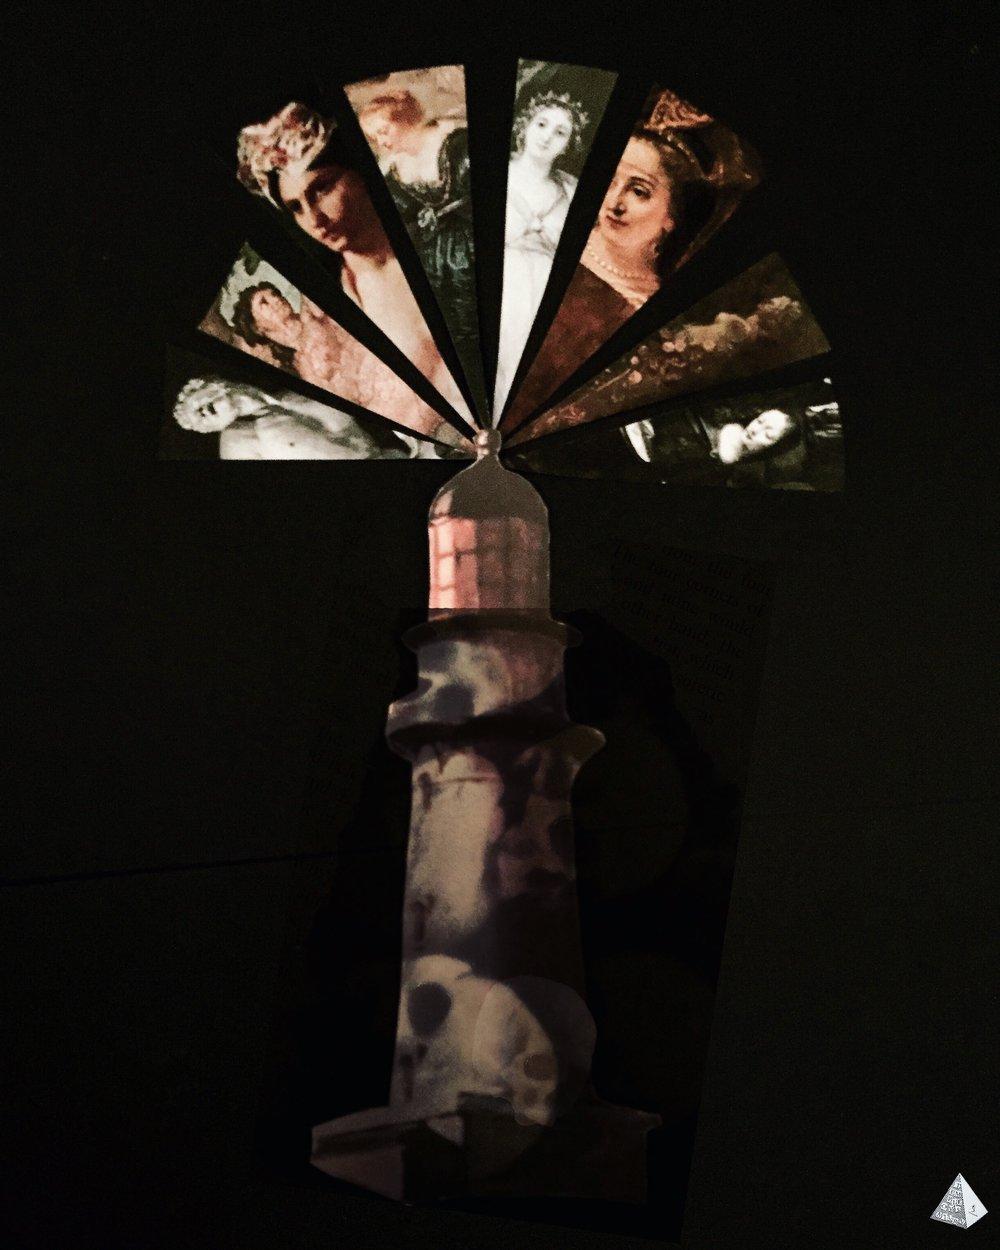 Les Fleurs du Mal: Les Phares by Joan Pope (Temple ov Saturn)